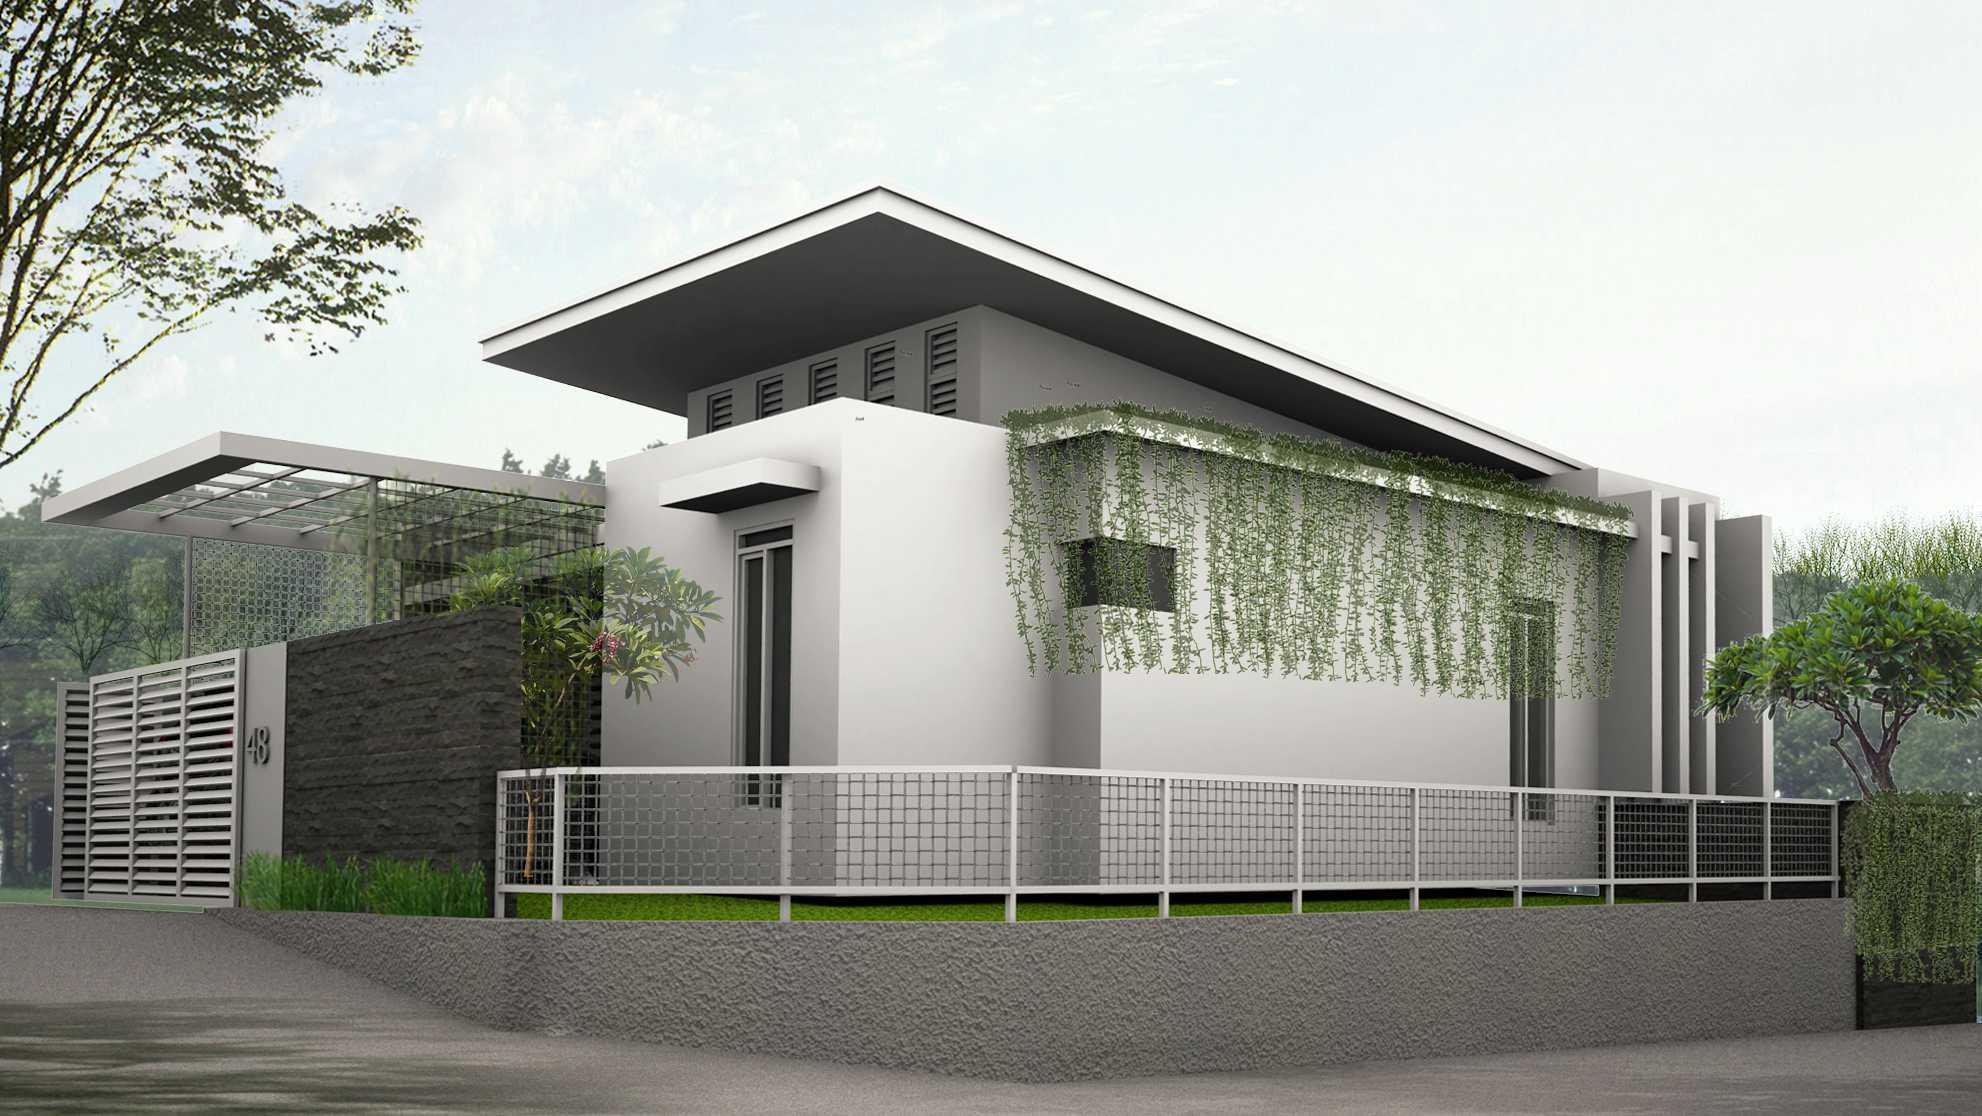 Daun Architect Rumah Tinggal Mini Cimuncang Bandung, Kota Bandung, Jawa Barat, Indonesia Bandung, Kota Bandung, Jawa Barat, Indonesia Daun-Architect-Rumah-Tinggal-Mini-Cimuncang  64540